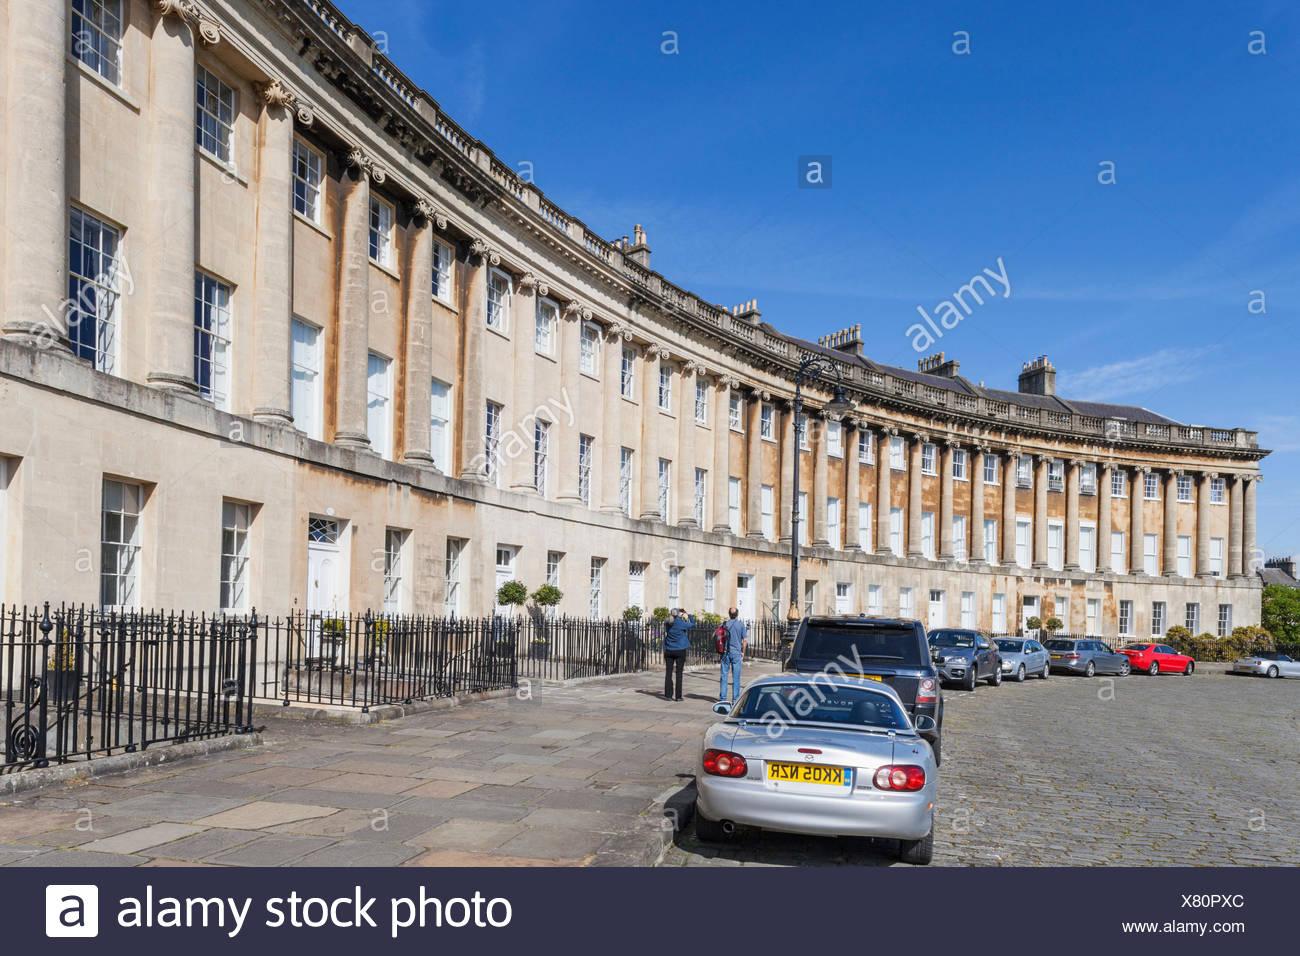 England, Somerset, Bath, Roman Baths, Royal Cresent - Stock Image